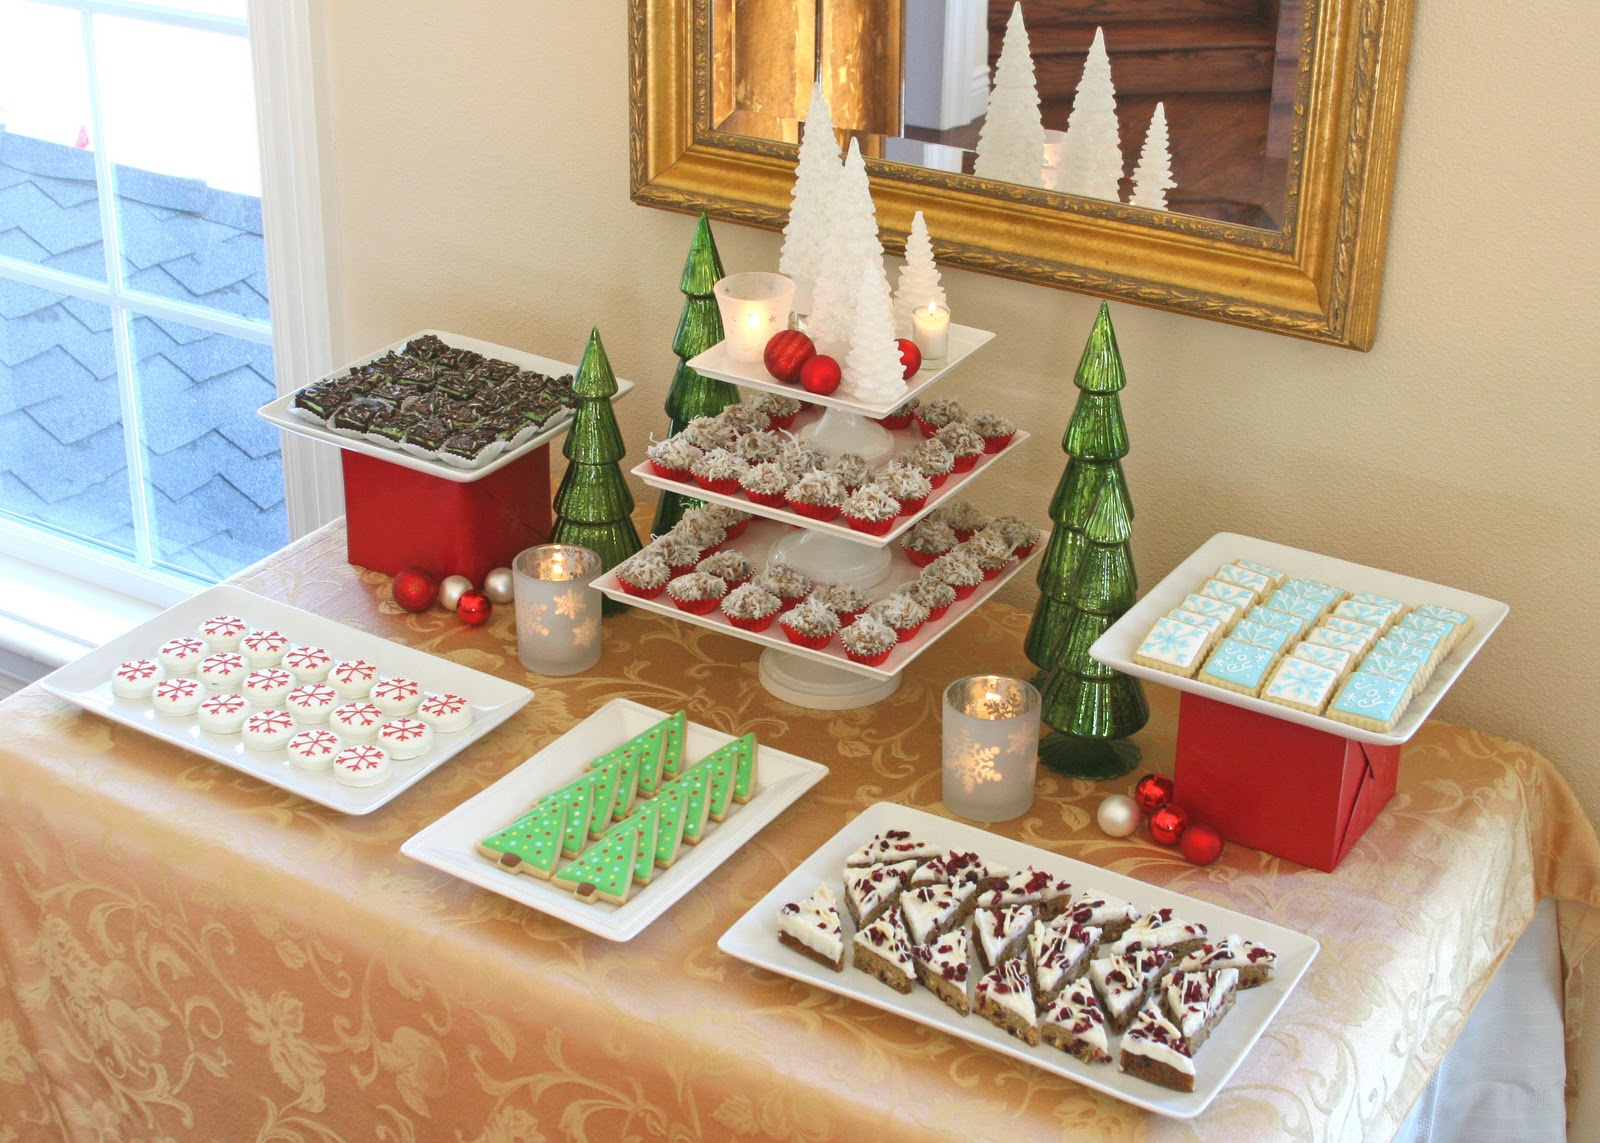 Christmas buffet table decoration ideas - Christmas Dessert Buffet Ideas Memes